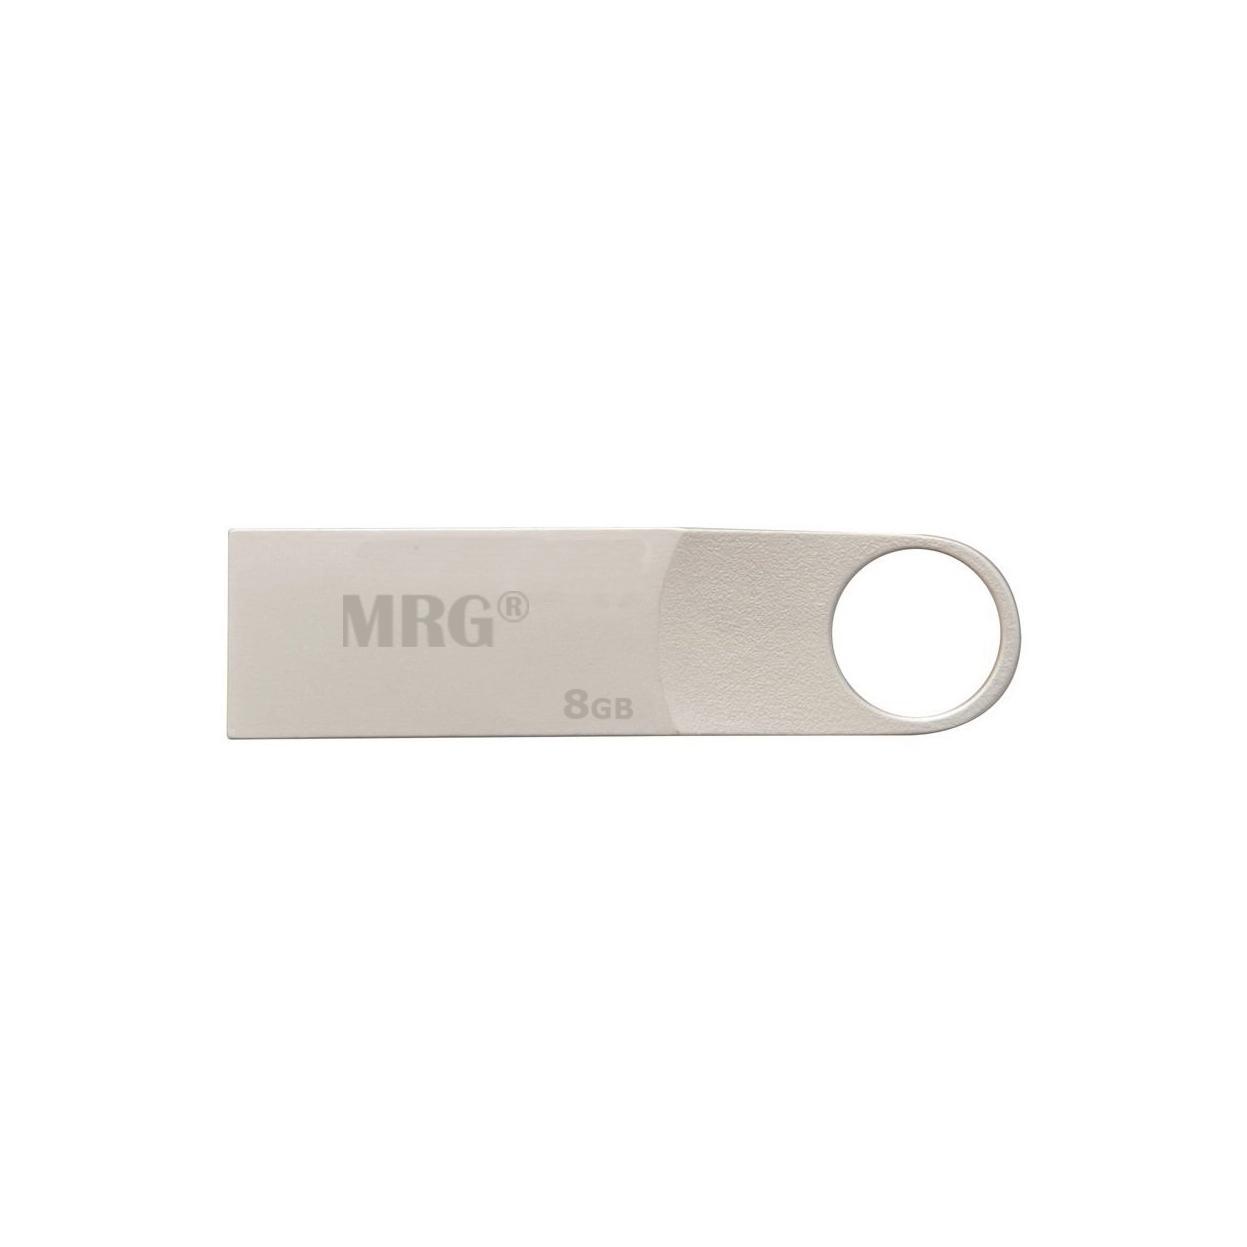 Memorie USB MRG M-SE9, USB 2.0, 8 GB, Gri